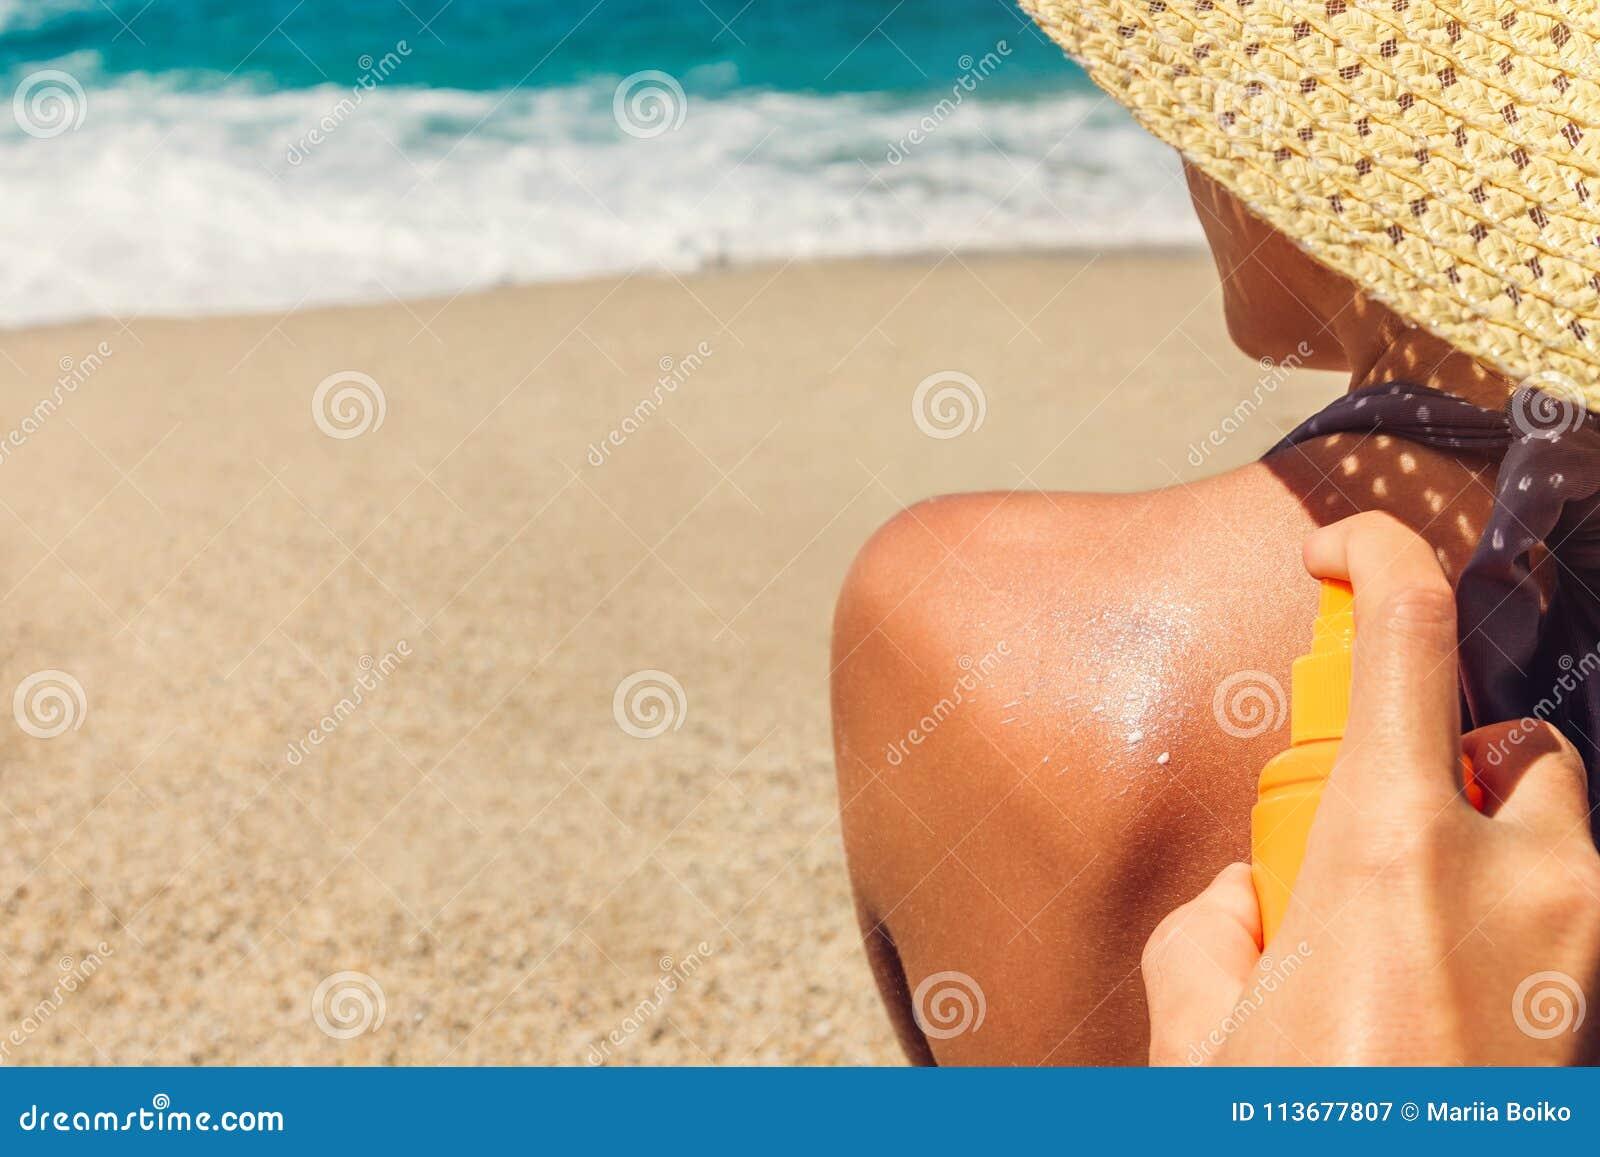 Sun cream protection. Man sprays sun cream on woman`s shoulder. Skin care concept. Healthy skin on vacation.